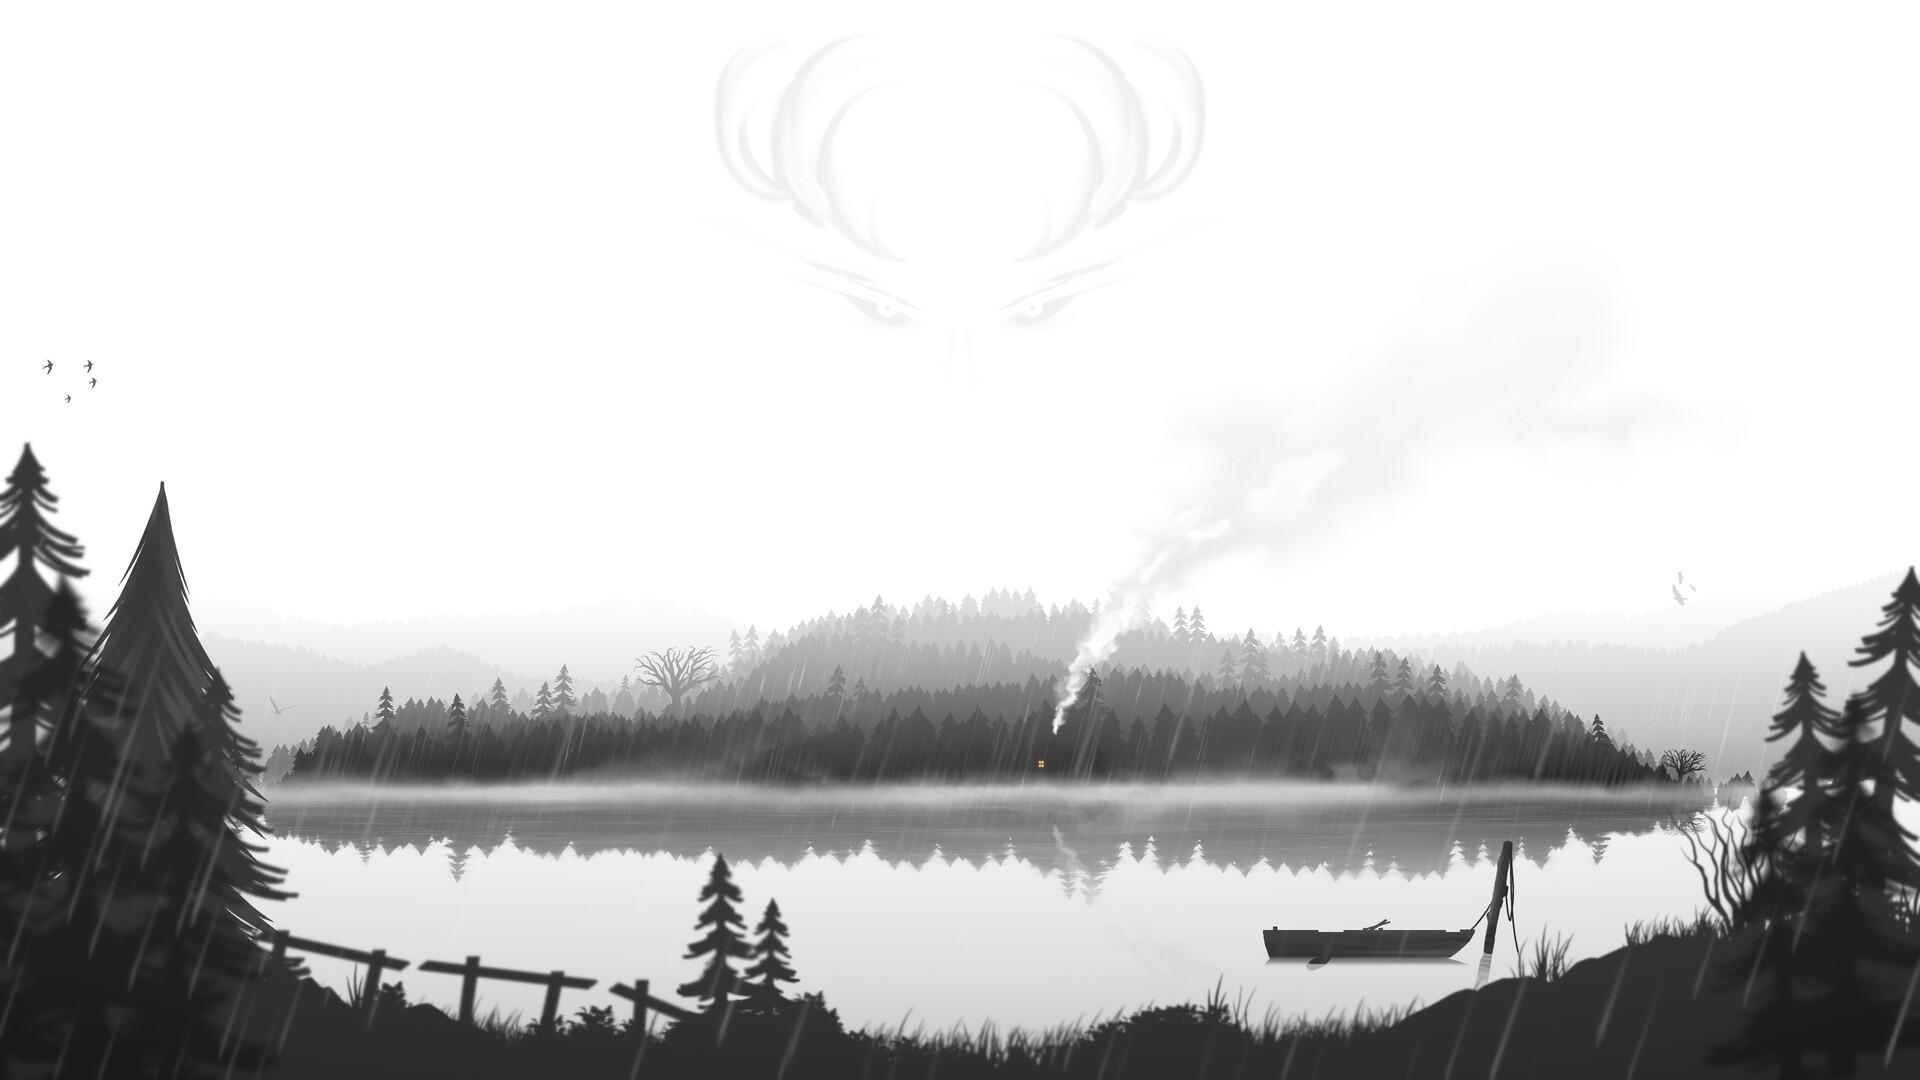 Fredrik Persson Digital Art Island Lake Gray Forest Boat Fantasy Art Eyes Antlers Mist 1920x1080